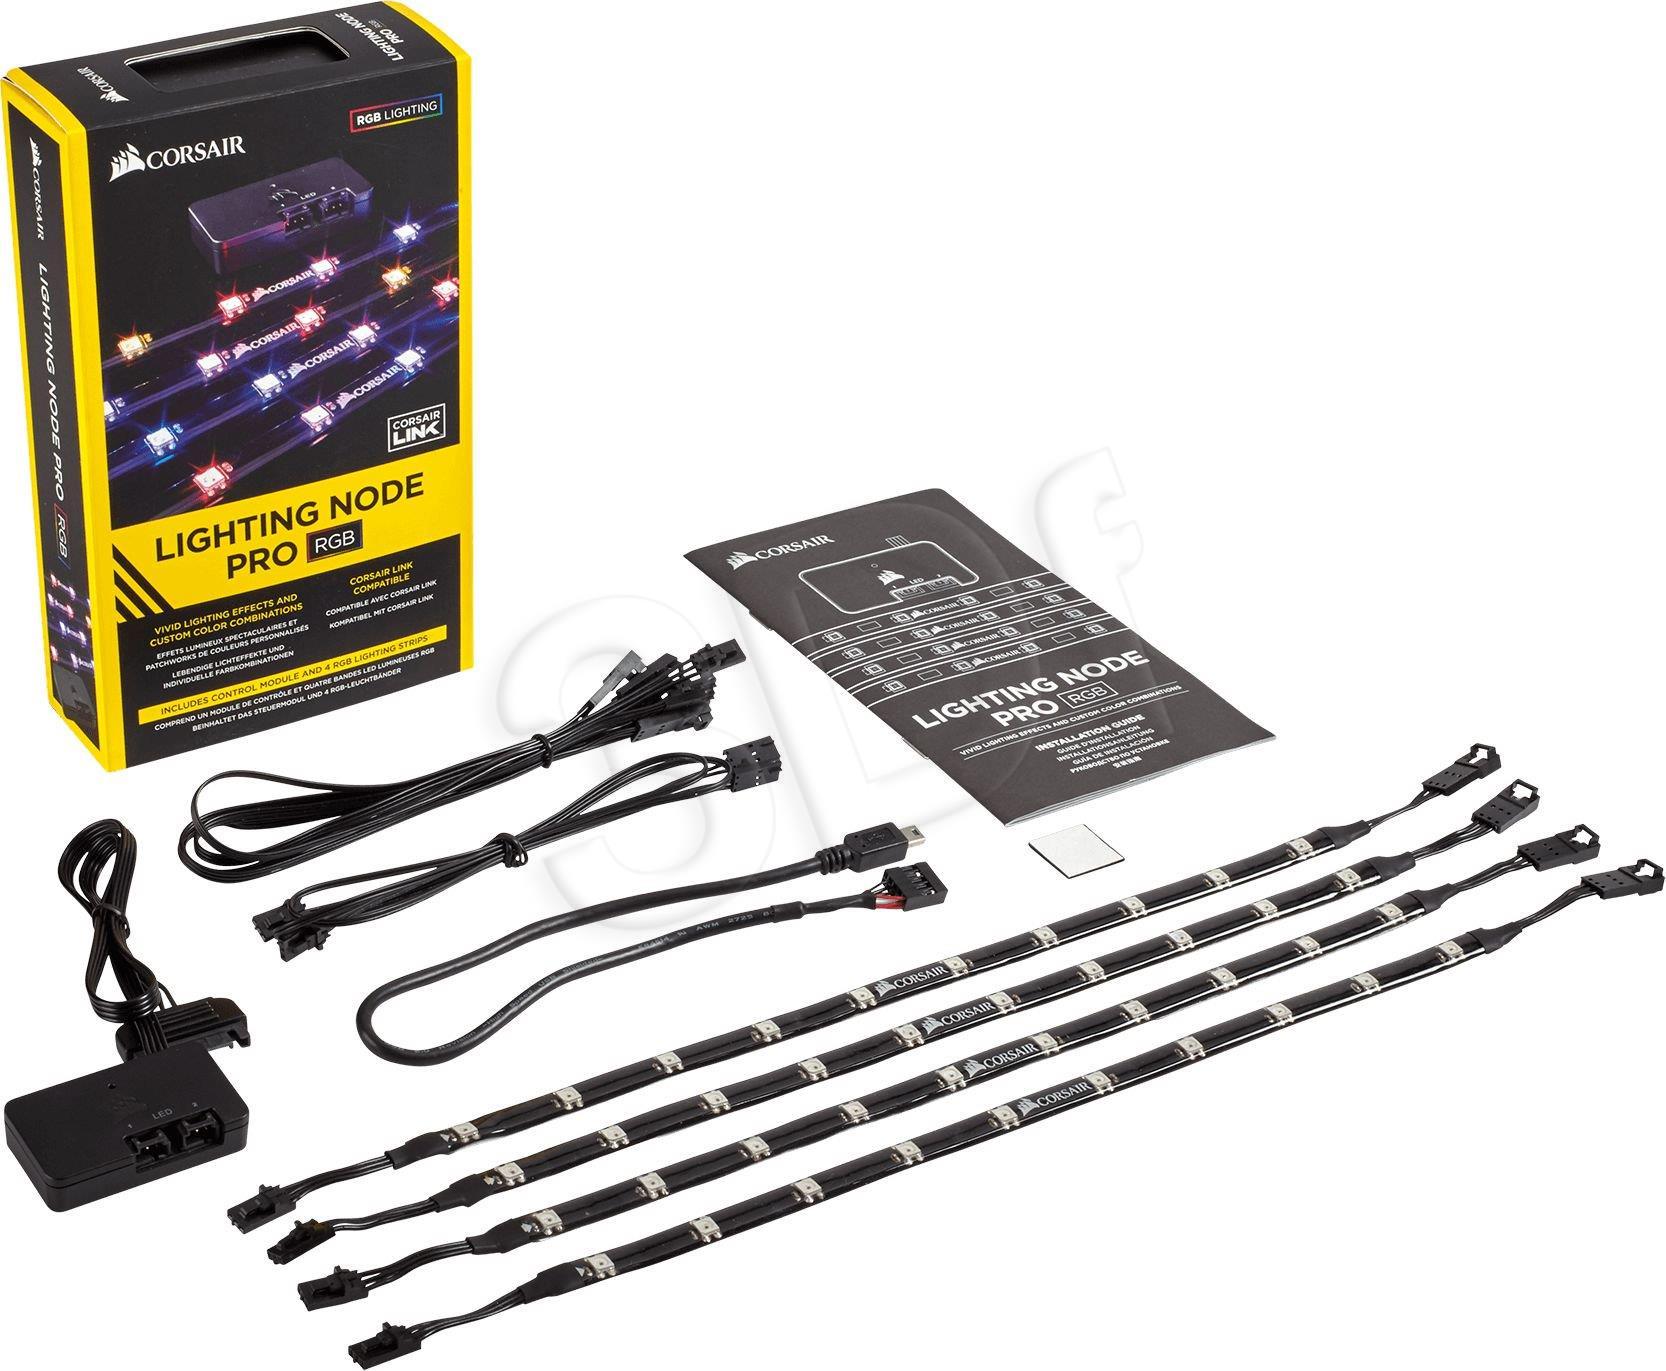 Corsair Lighting Node Pro USB 2.0 RGB LED (CL-9011109-WW) aksesuārs datorkorpusiem